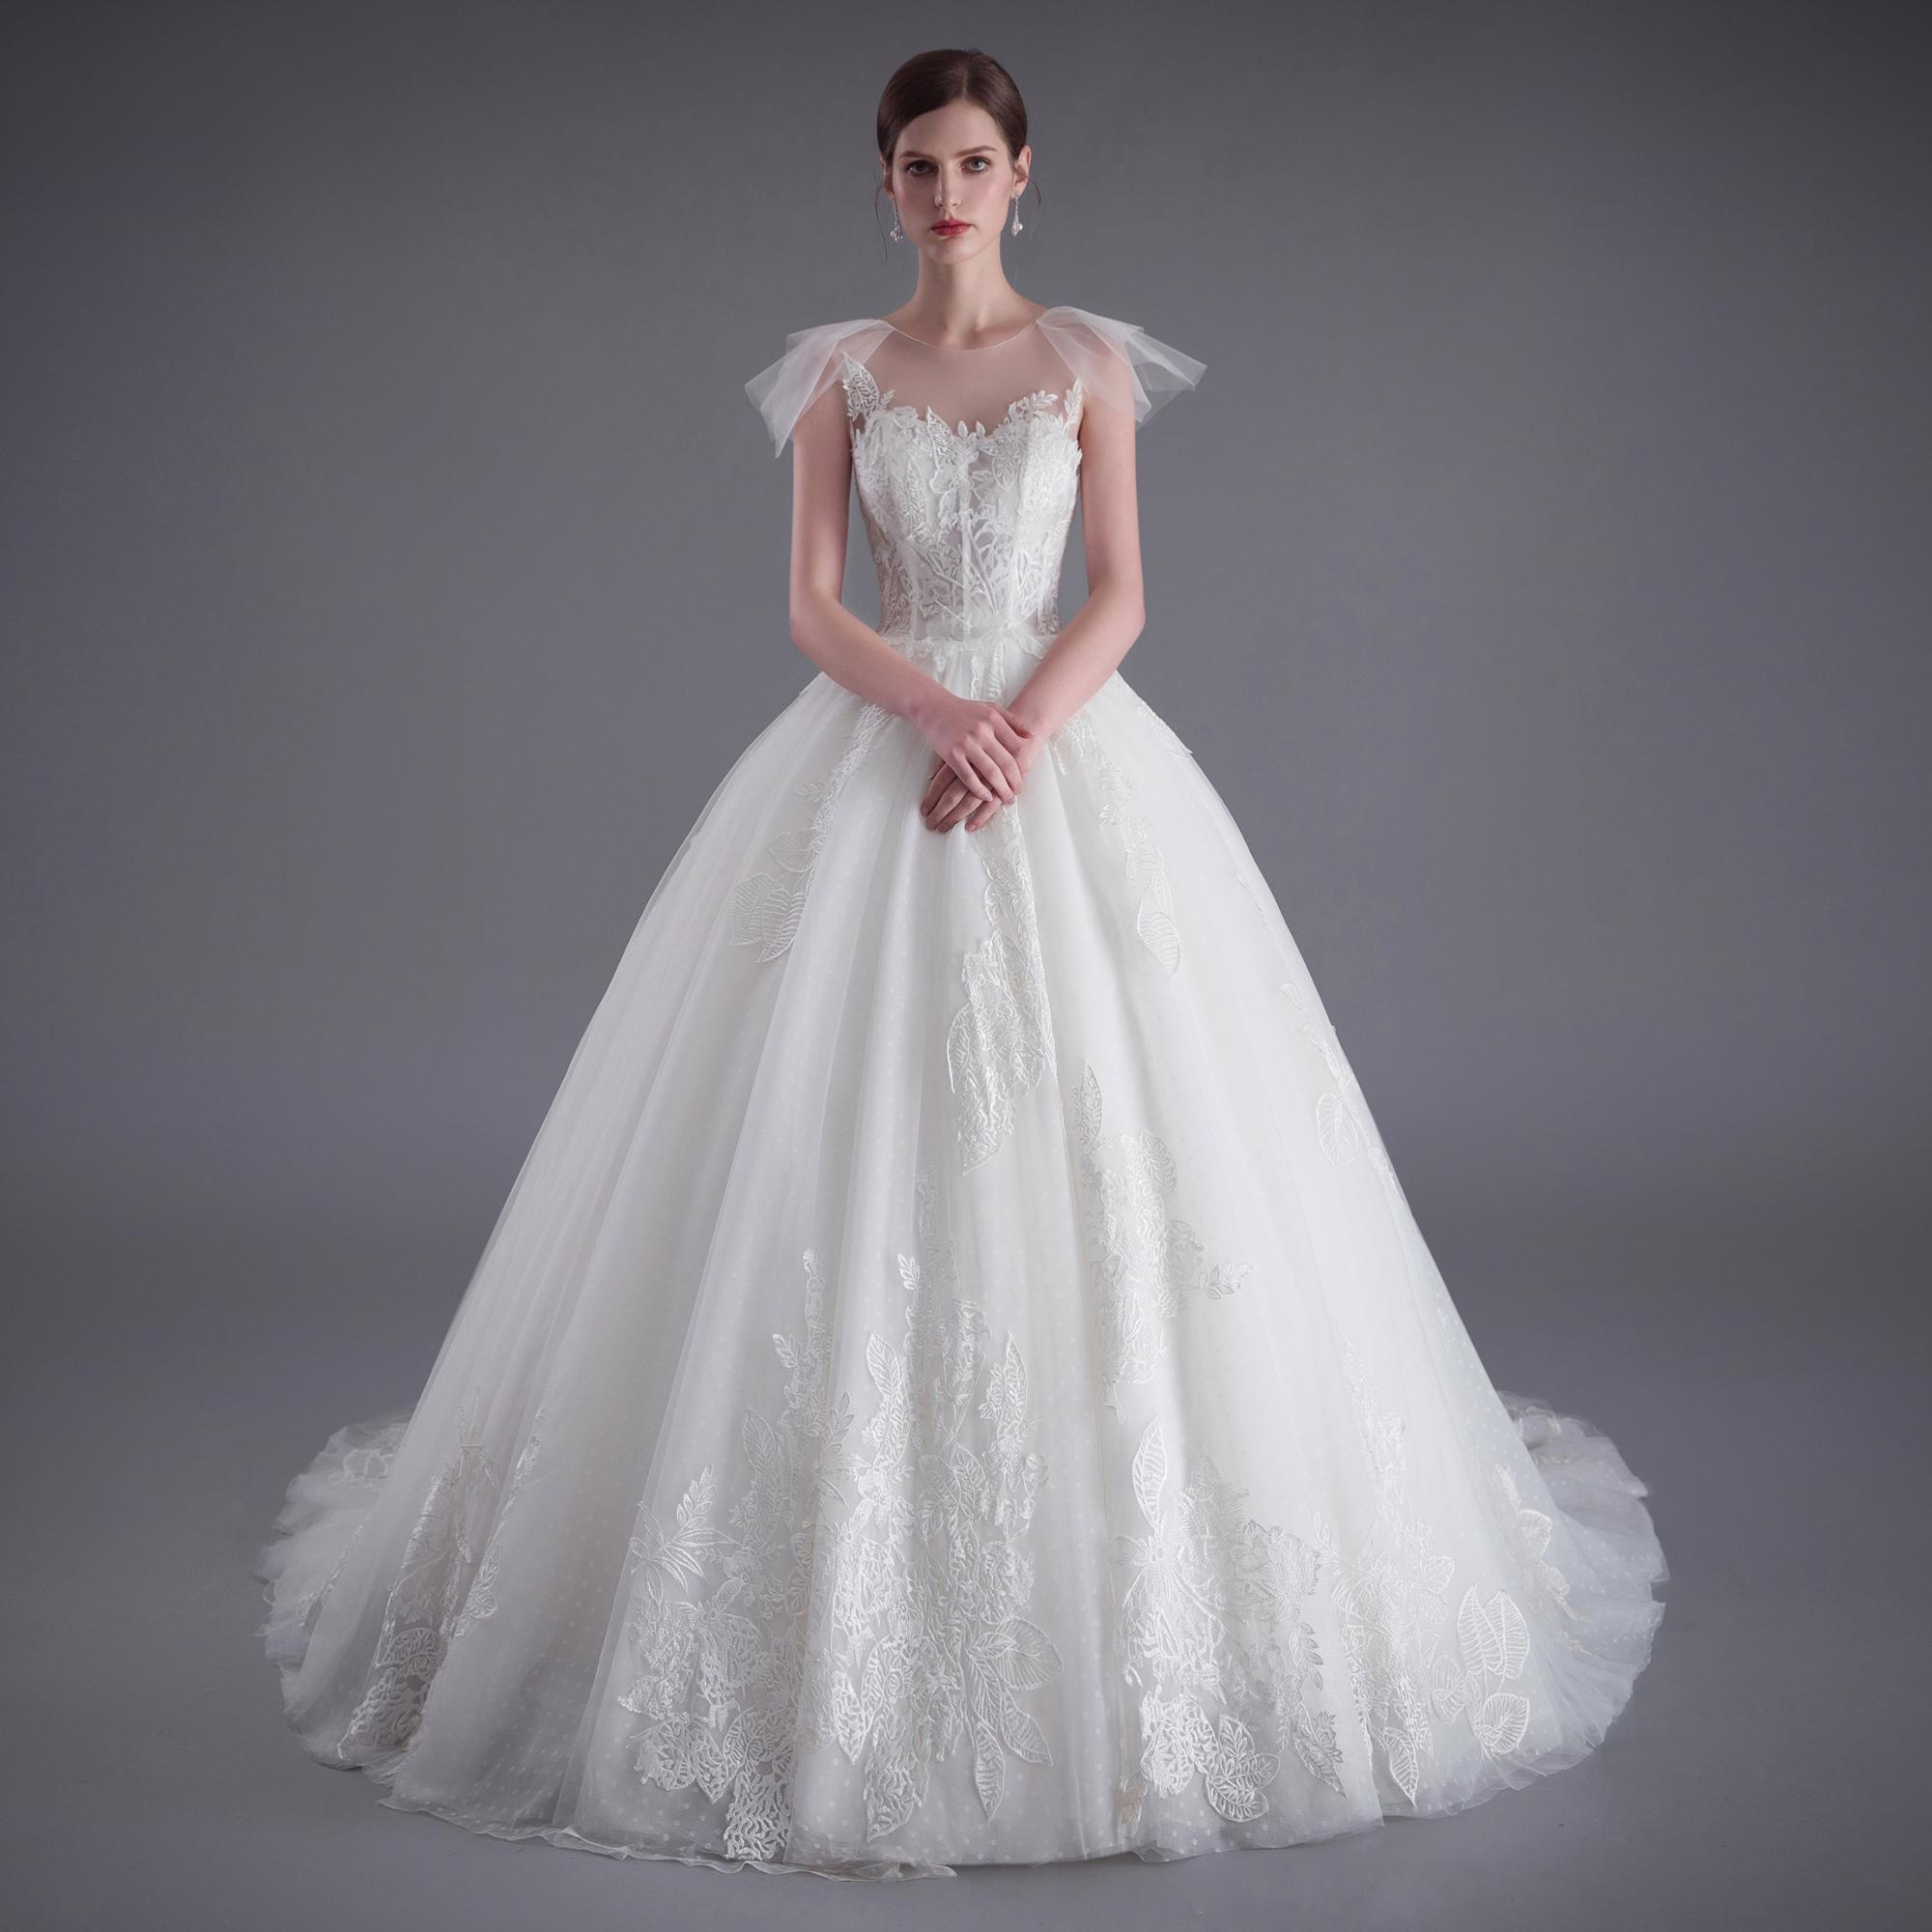 Wholesale short corset wedding dresses - Online Buy Best short ...